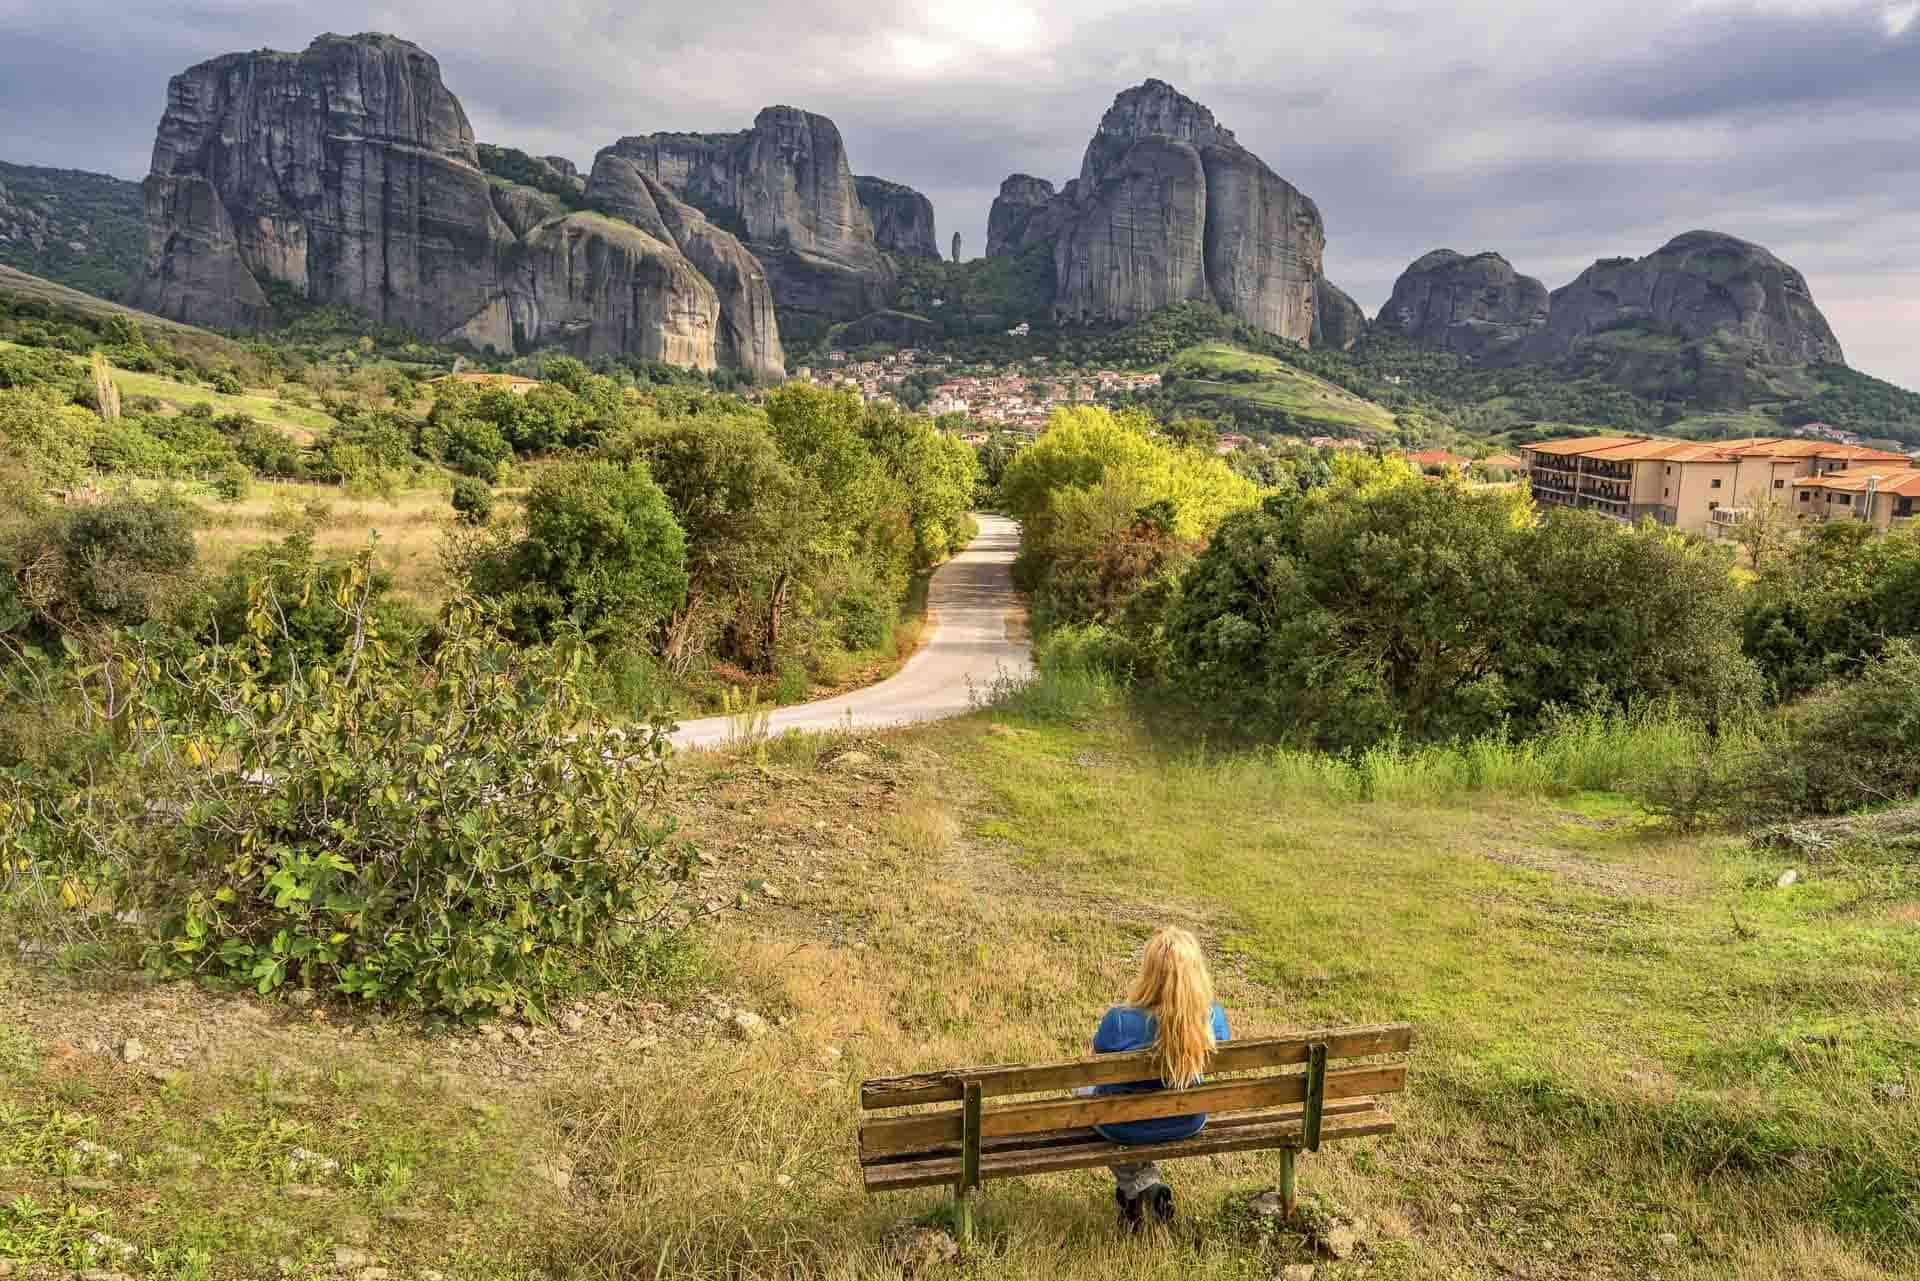 looking at the monasteries of Meteora Greece